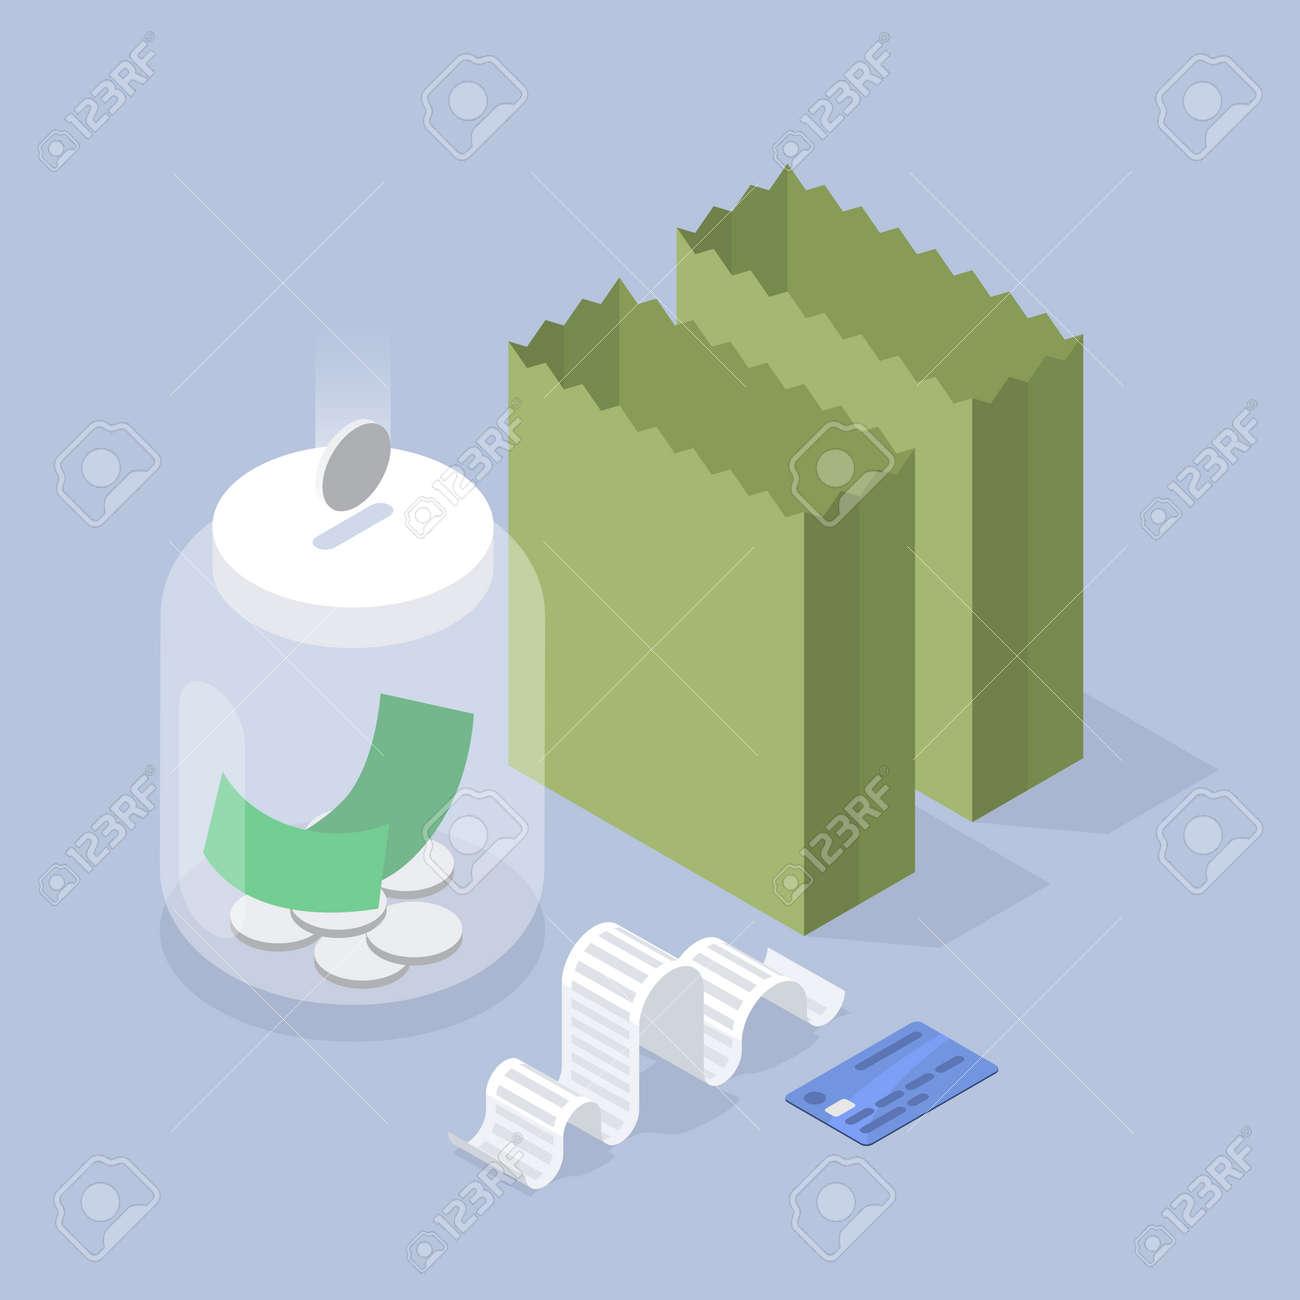 Saving Money Isometric Illustration - 171367106